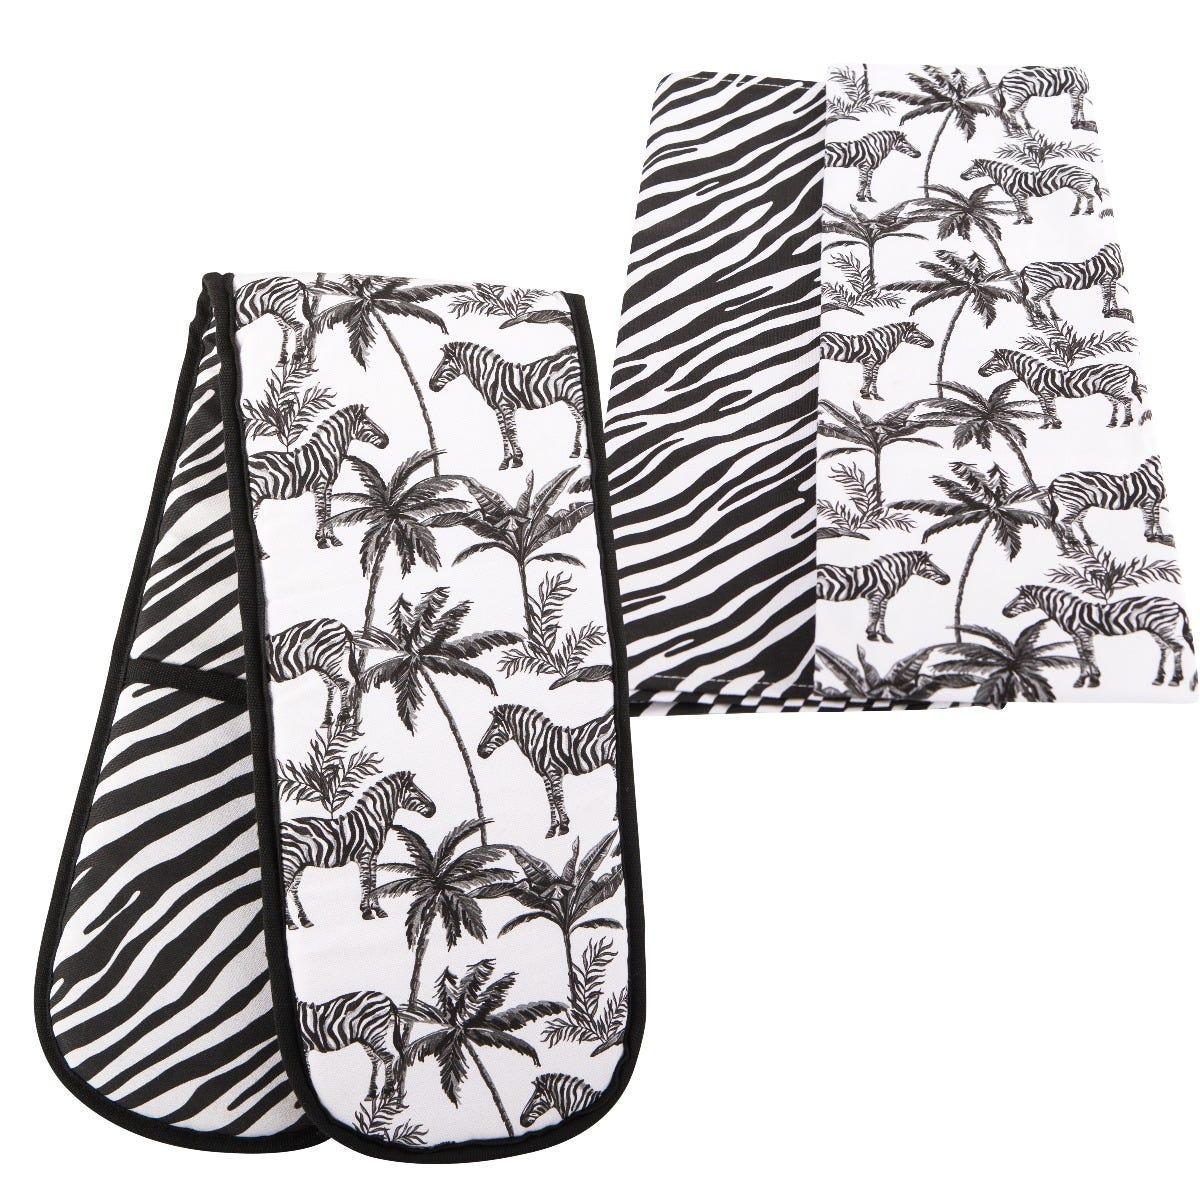 Beau & Elliot Madagascar Tea Towel & Double Oven Glove Set